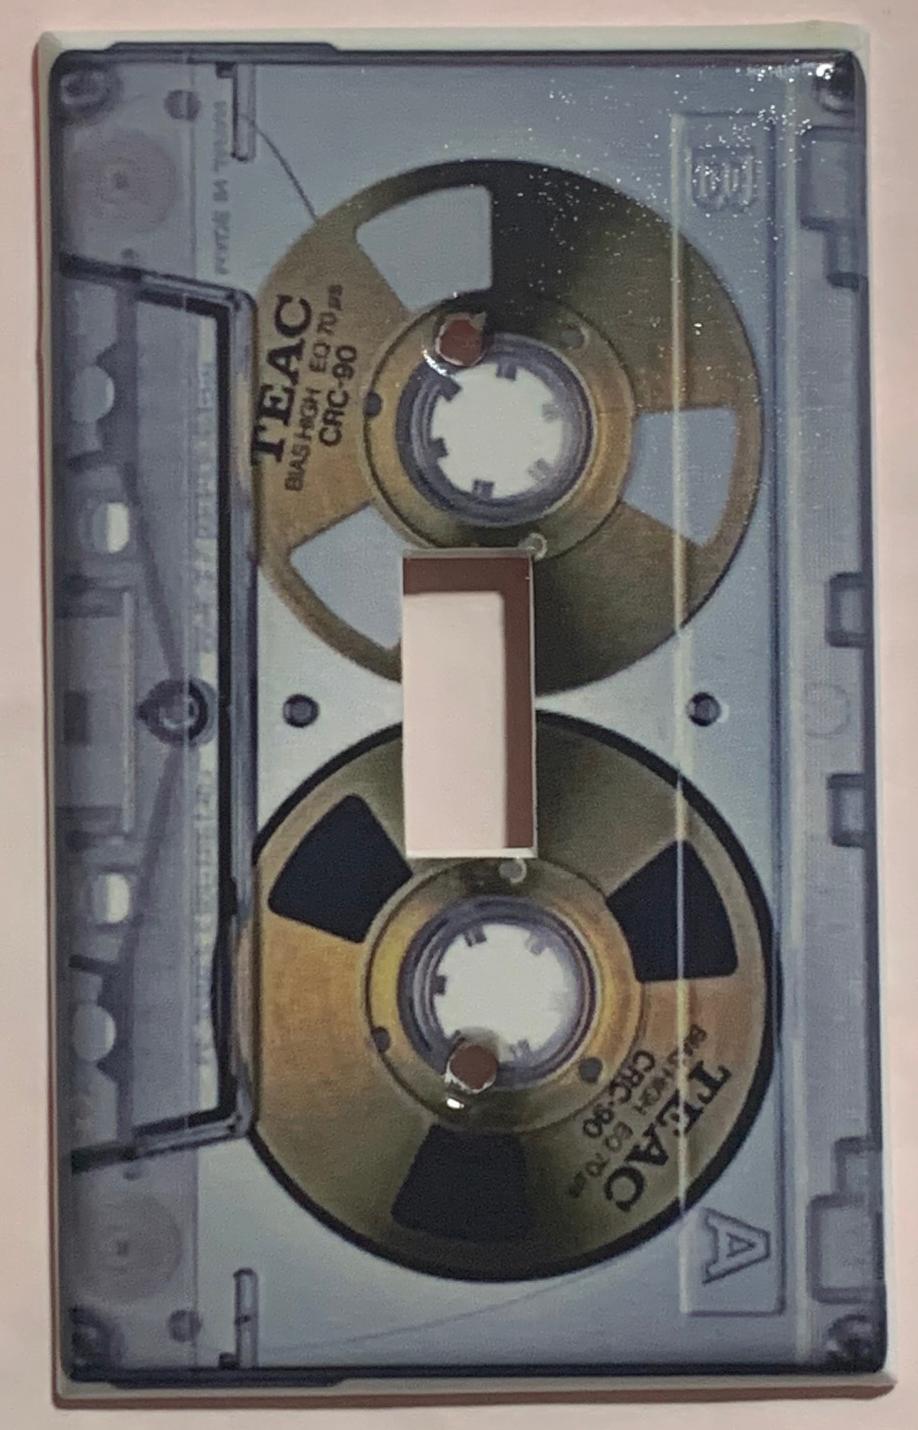 Cassette tape single toggle